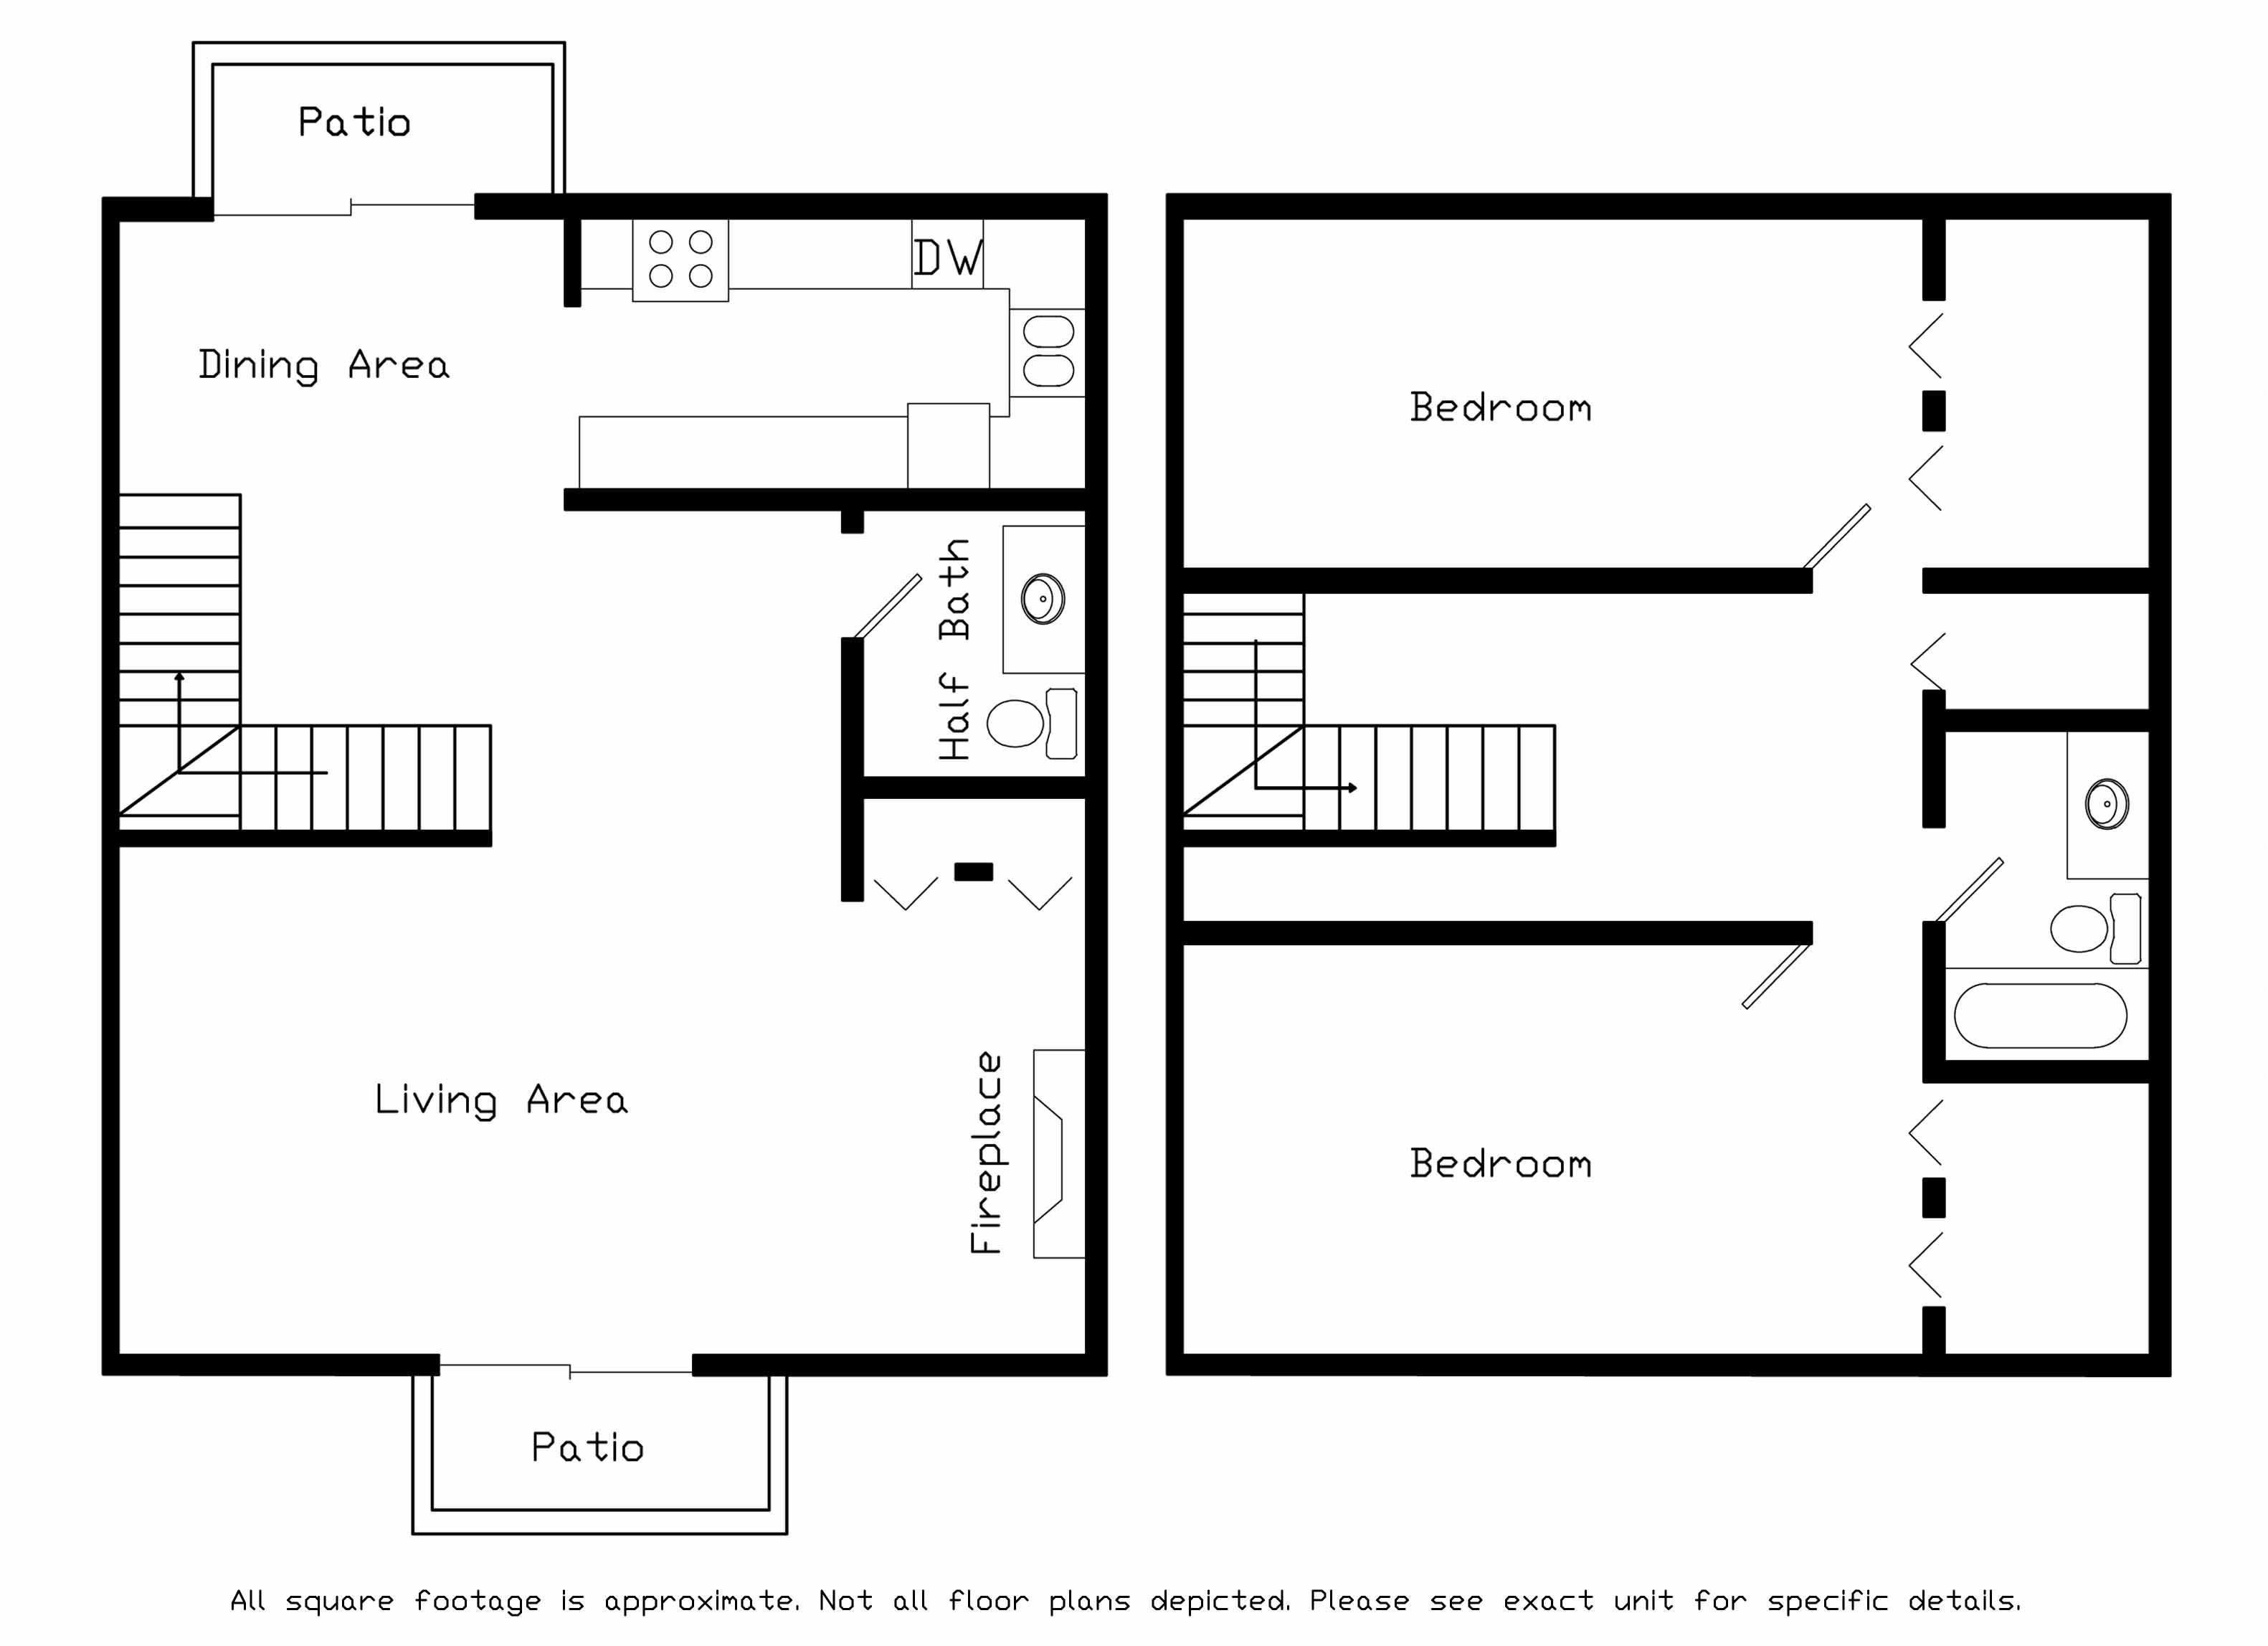 2LG Floor Plan 4